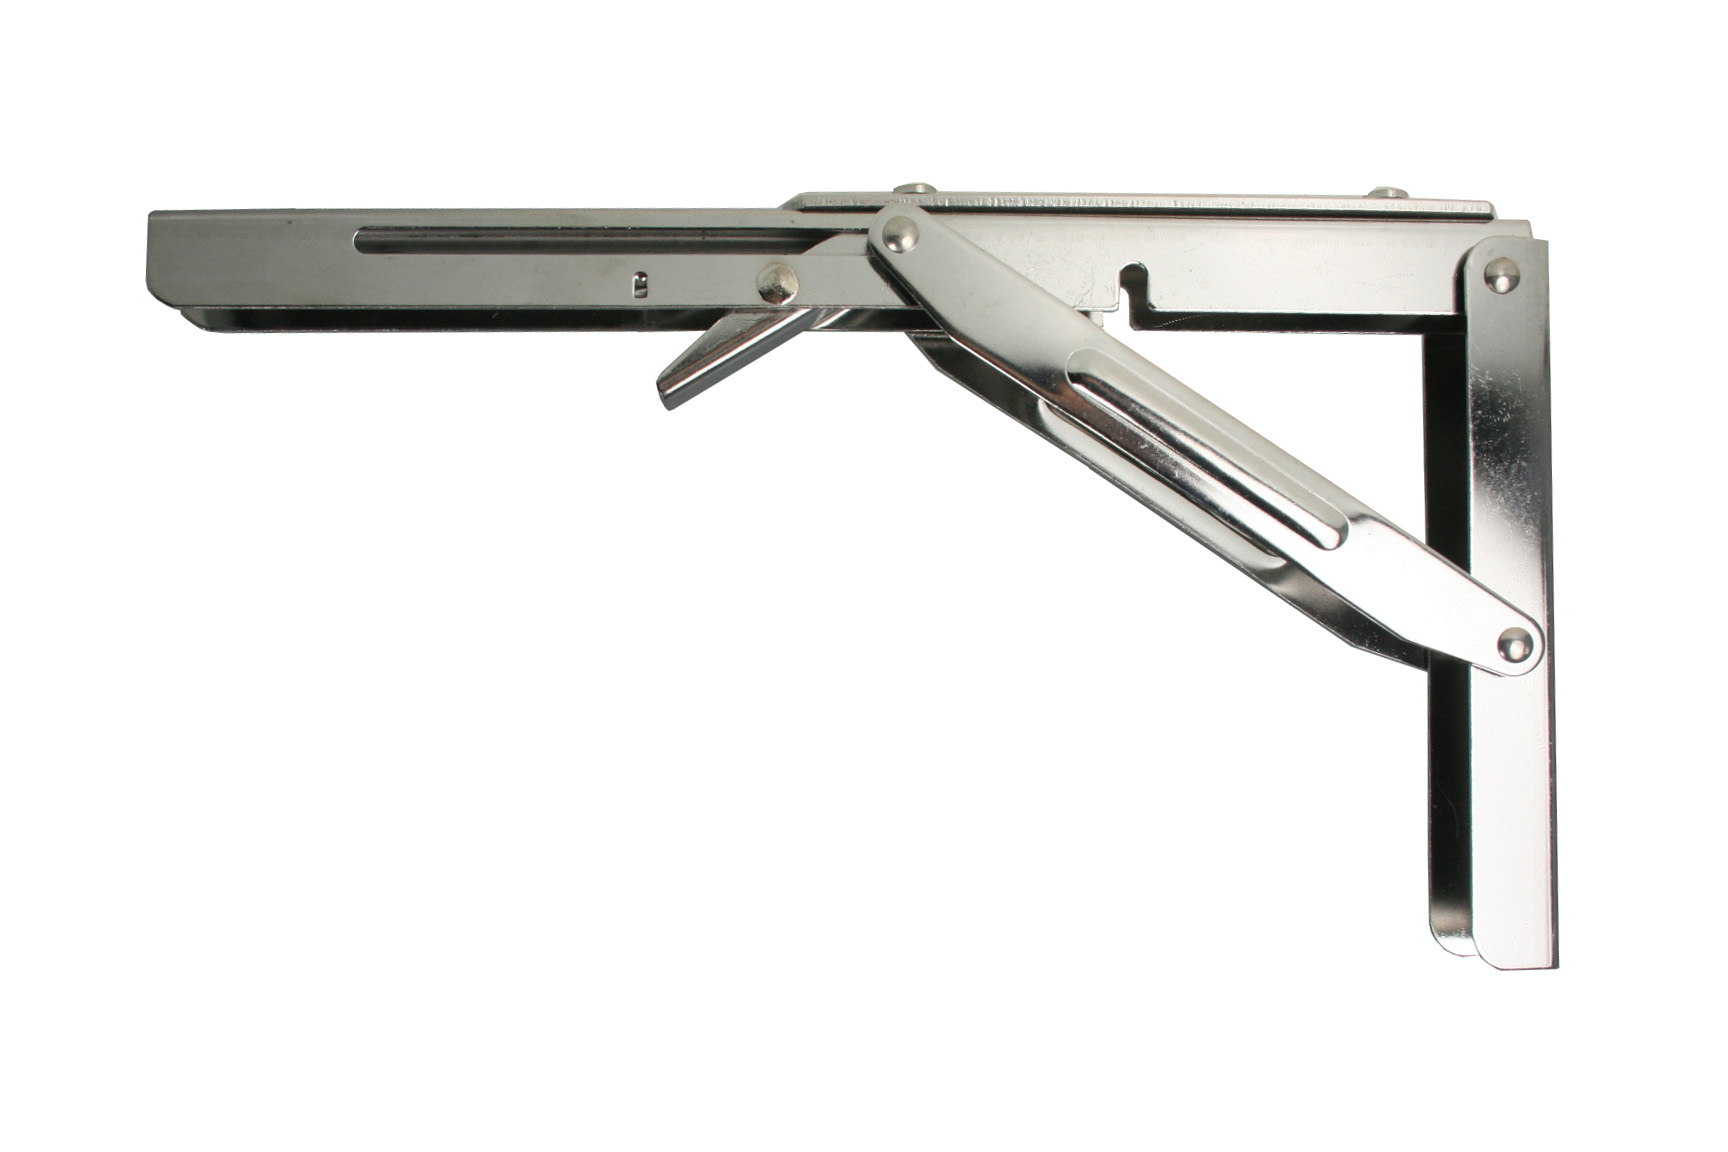 tischhalter arbeitsplattenhalter klapptisch edelstahl arbo inox arbo inox. Black Bedroom Furniture Sets. Home Design Ideas